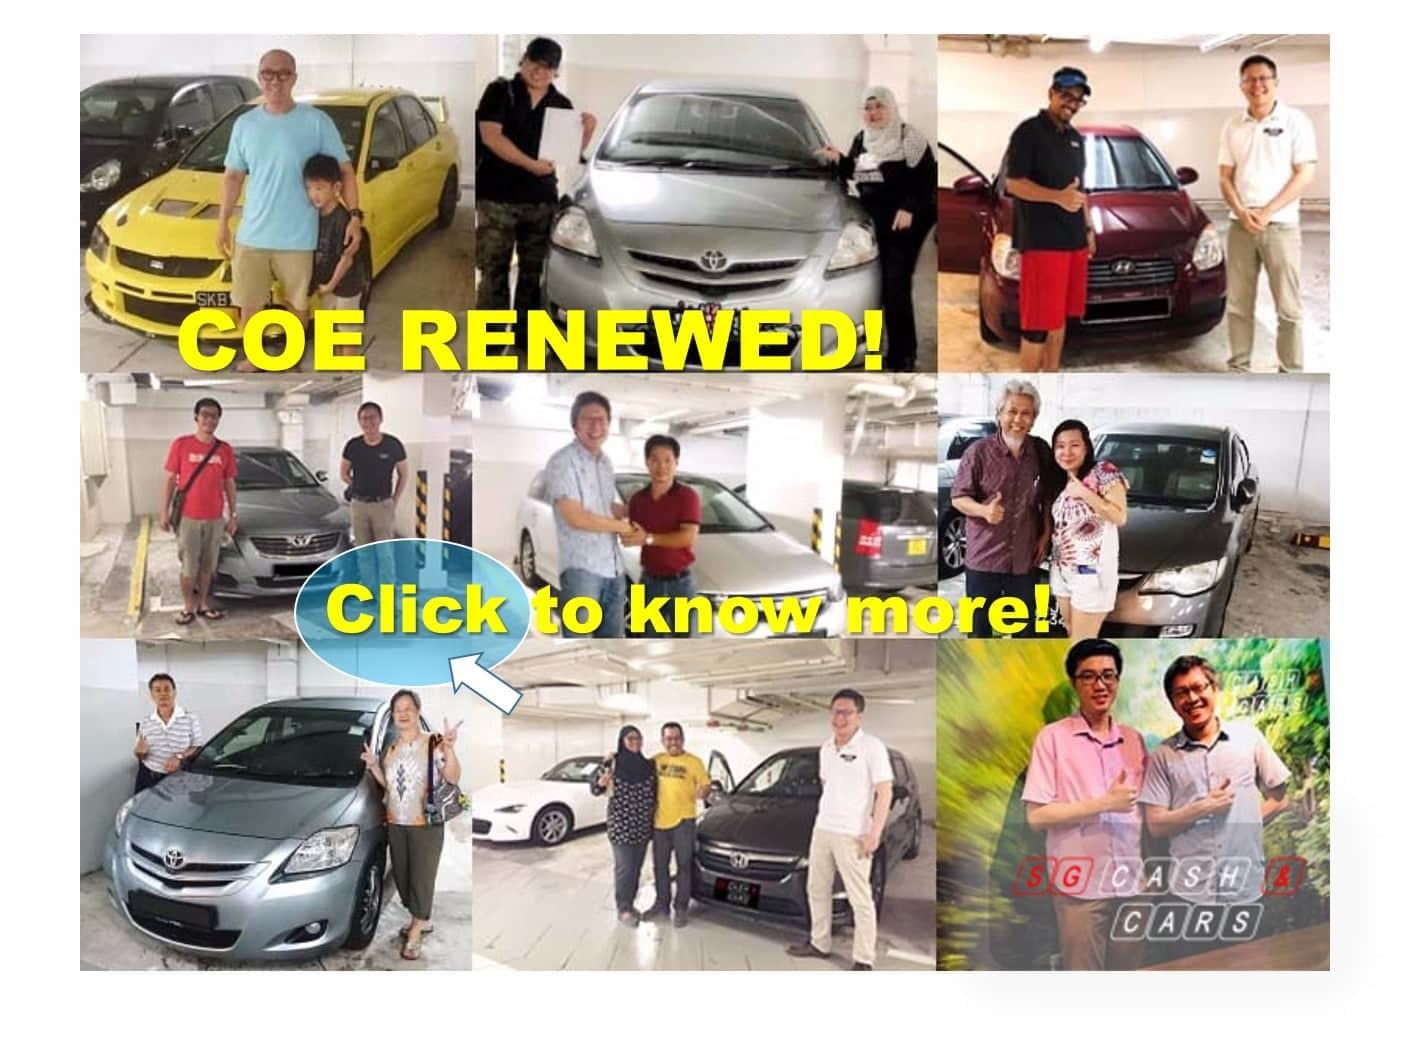 COE Renewed Customers! All Happy They Chose SG Cash N Cars!